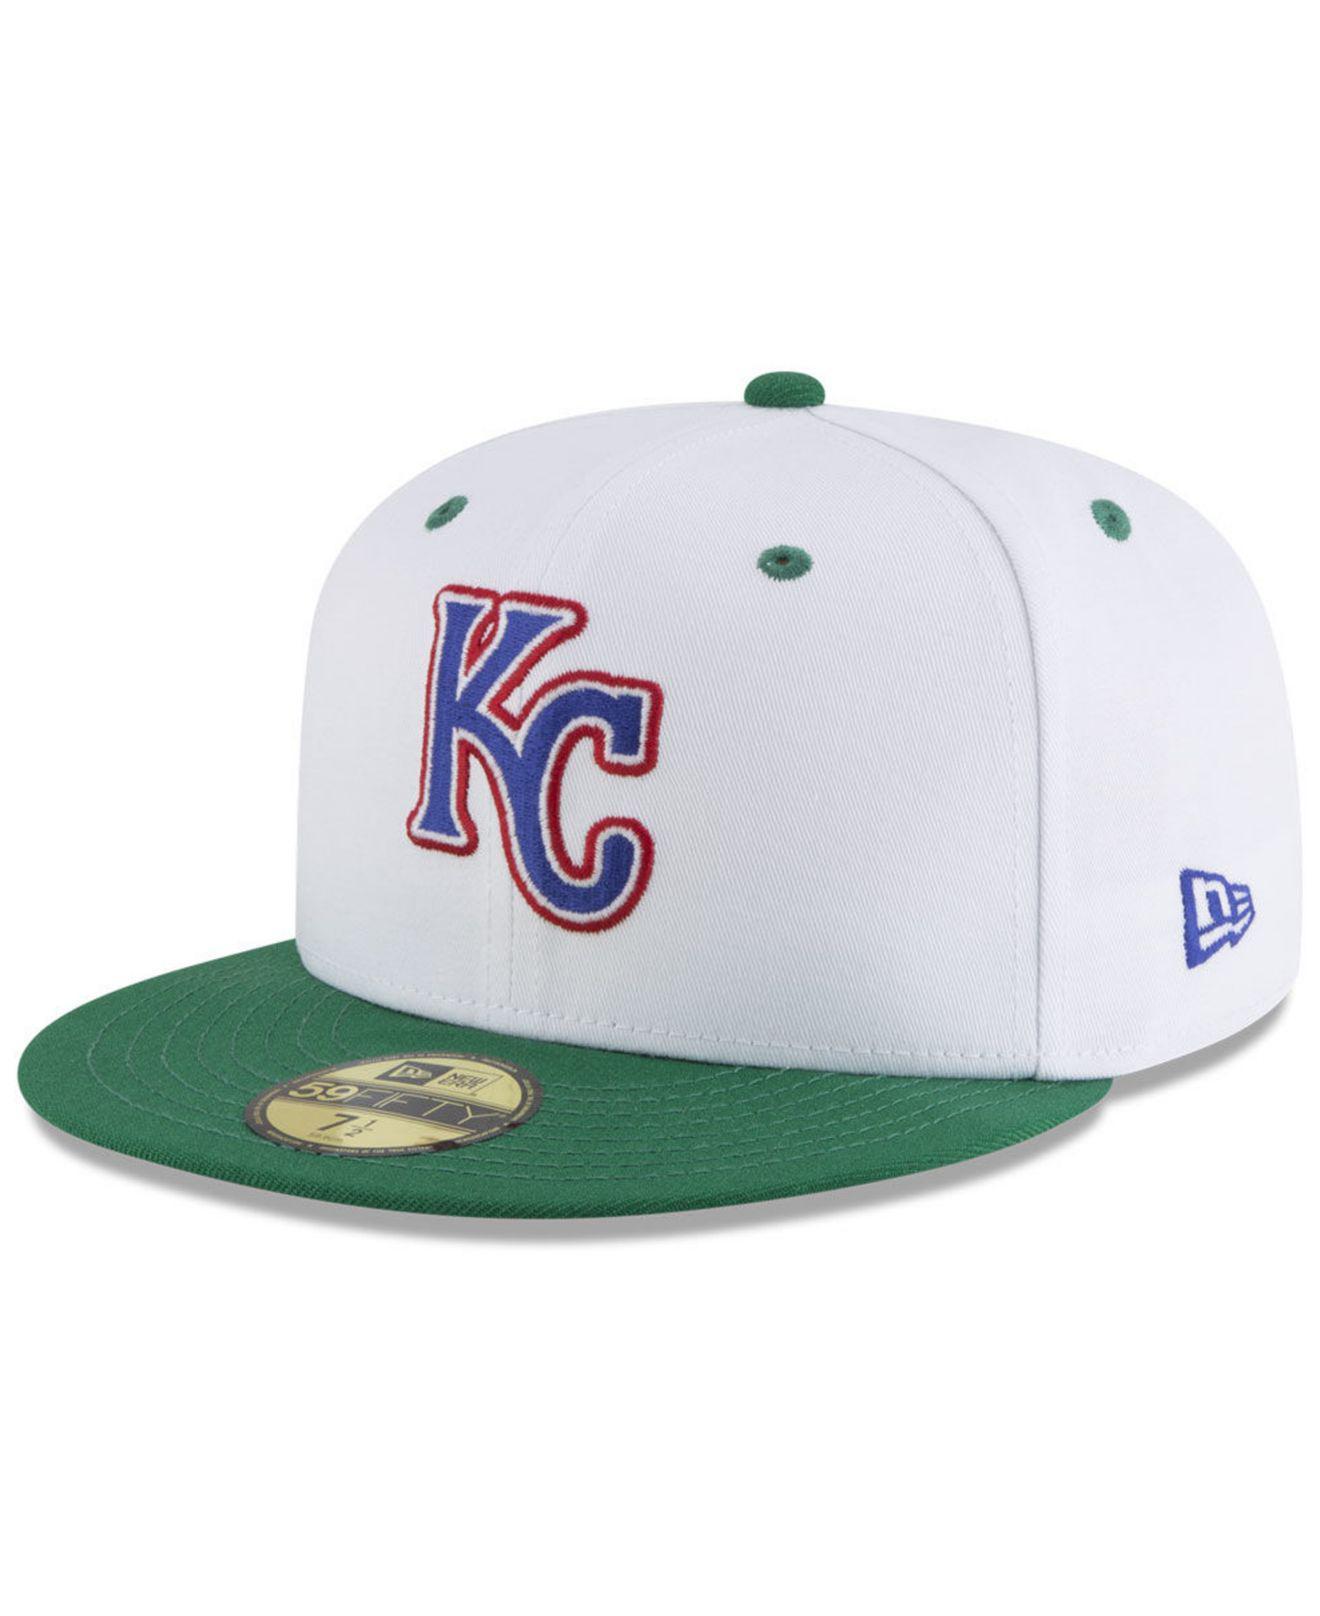 info for 5052a 56500 ... australia kansas city royals retro diamond 59fifty fitted cap for men  lyst. view fullscreen 381e2